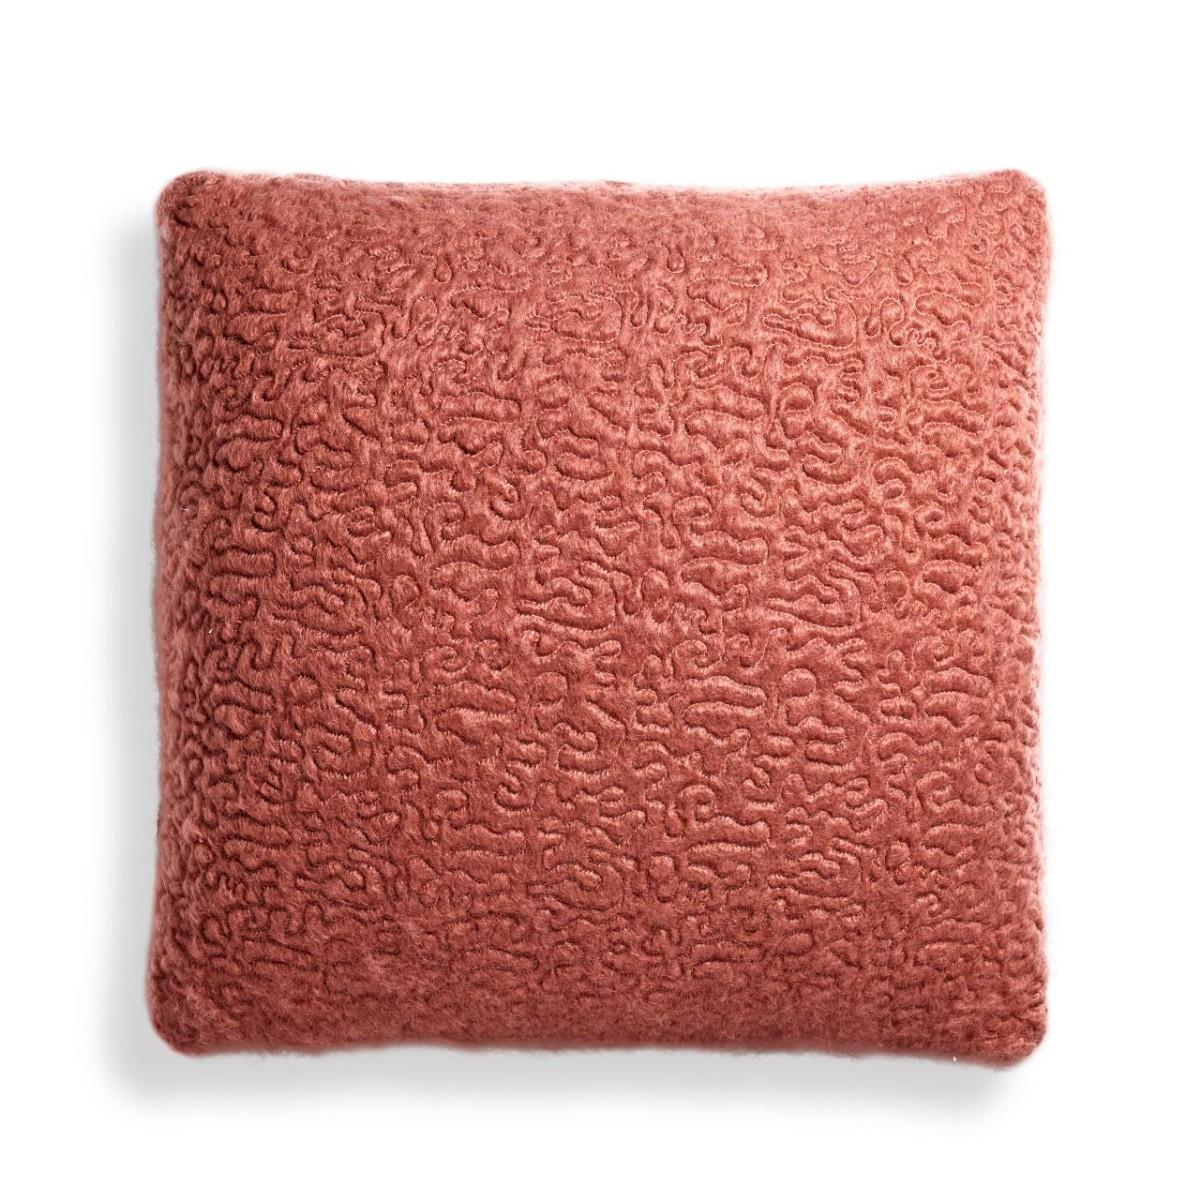 L'Objet I Haas Vermiculation Pillow I Brick